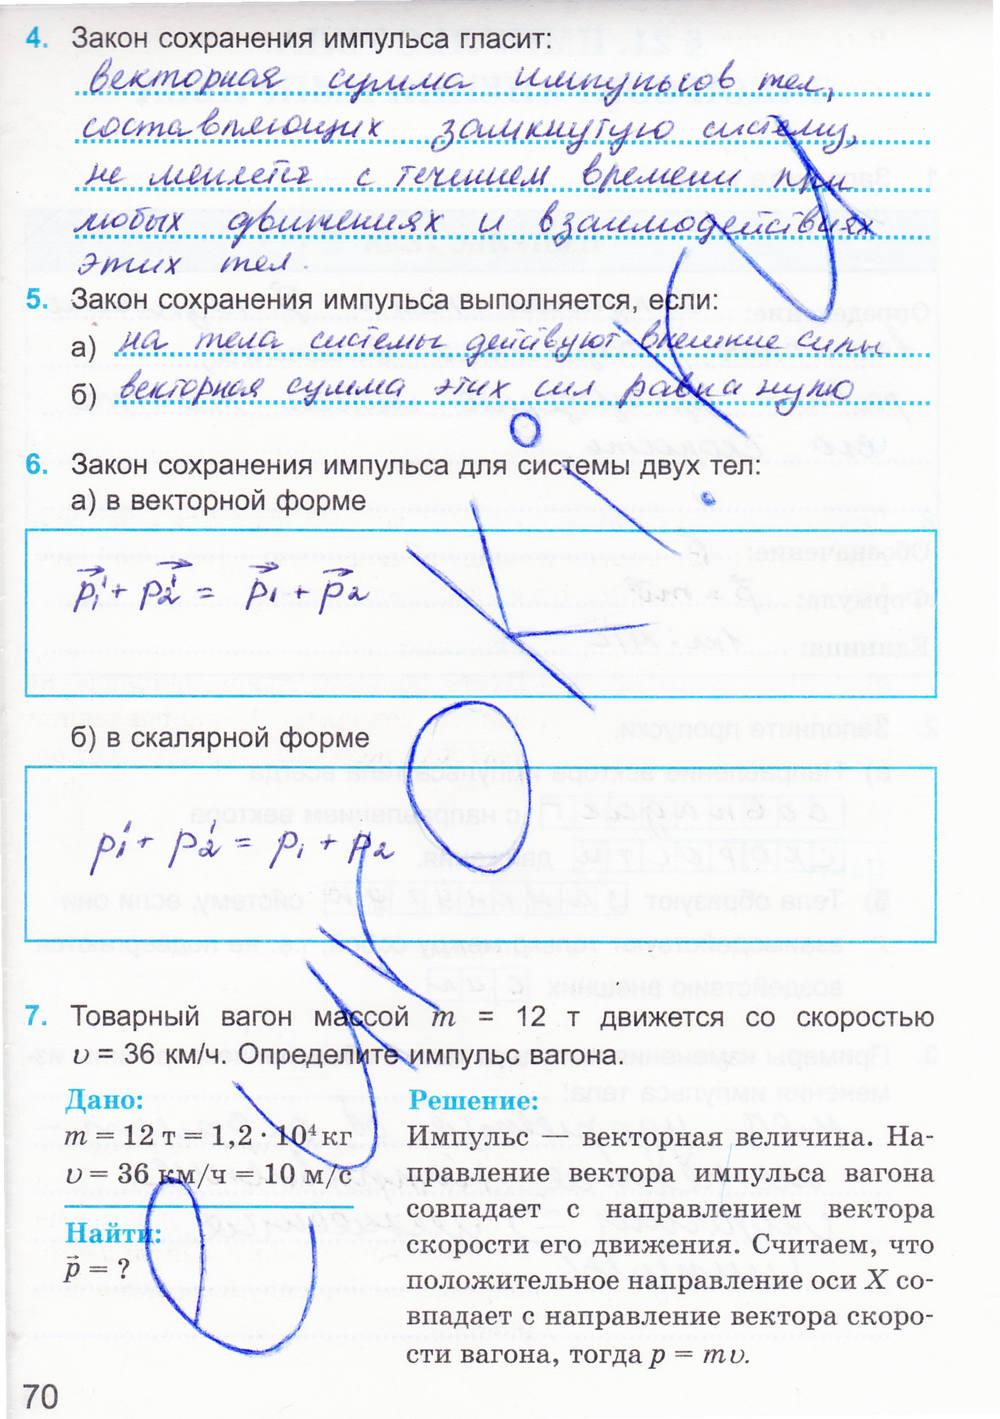 Решебник К Учебнику Физики Касьянова